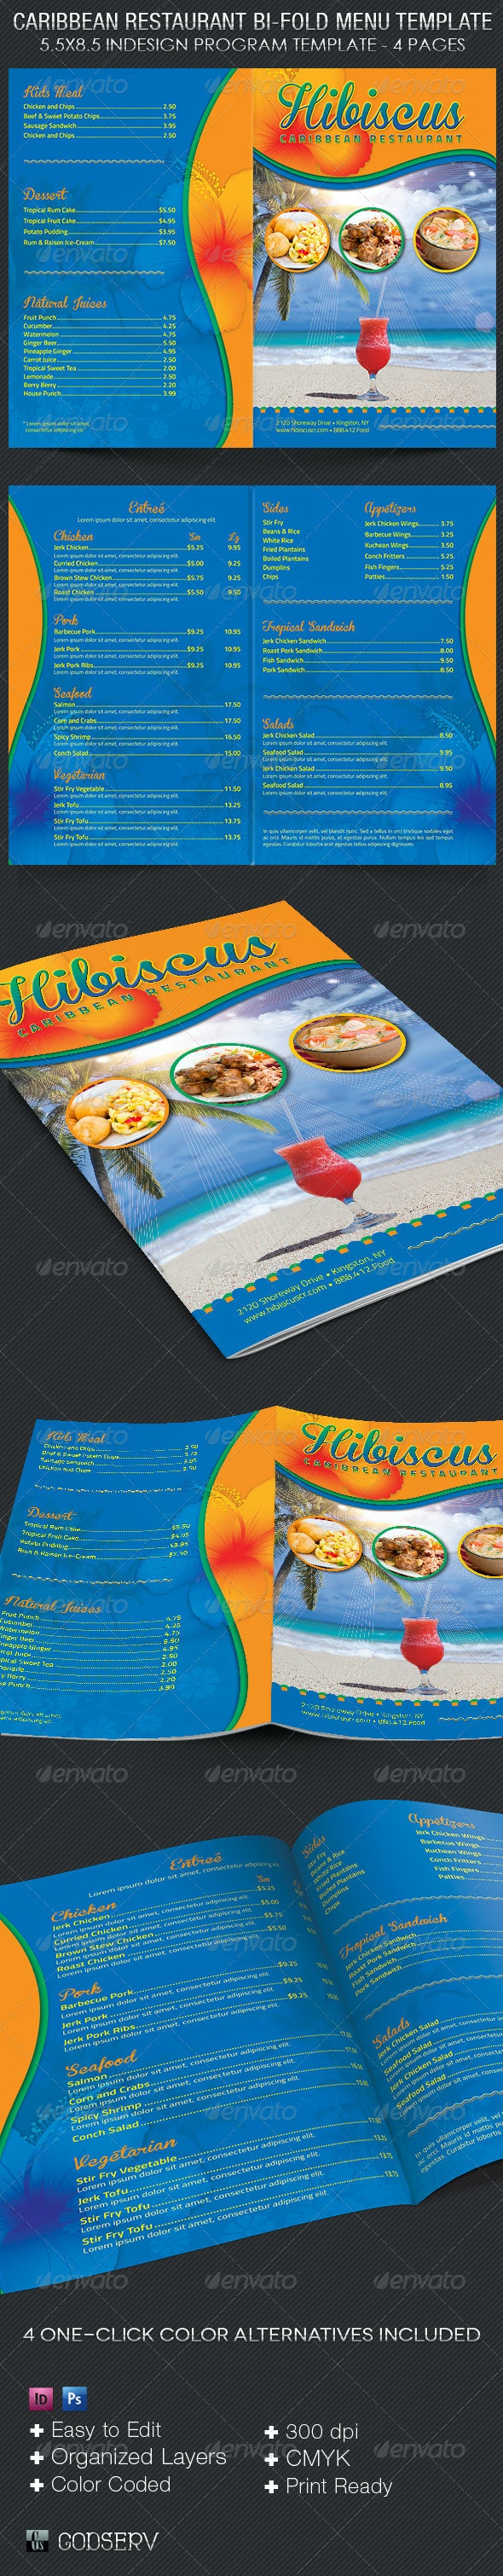 Caribbean Restaurant Menu Template - Food Menus Print Templates